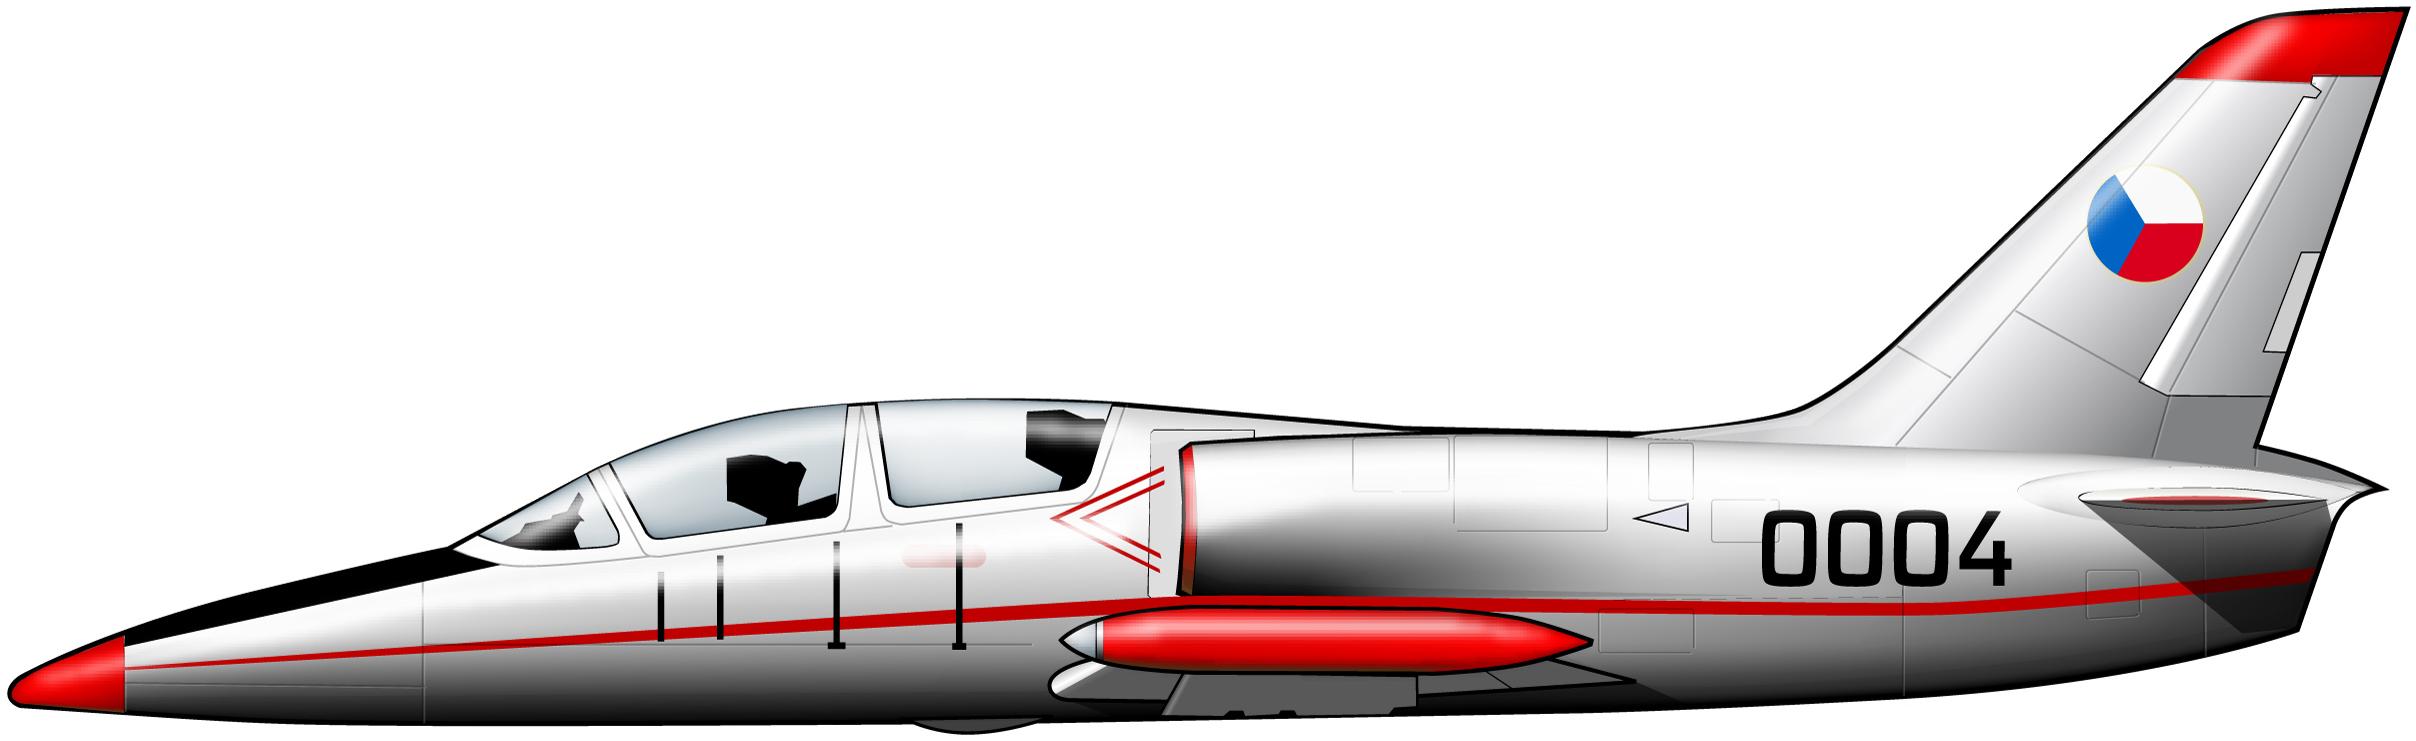 aerol39chequia2009